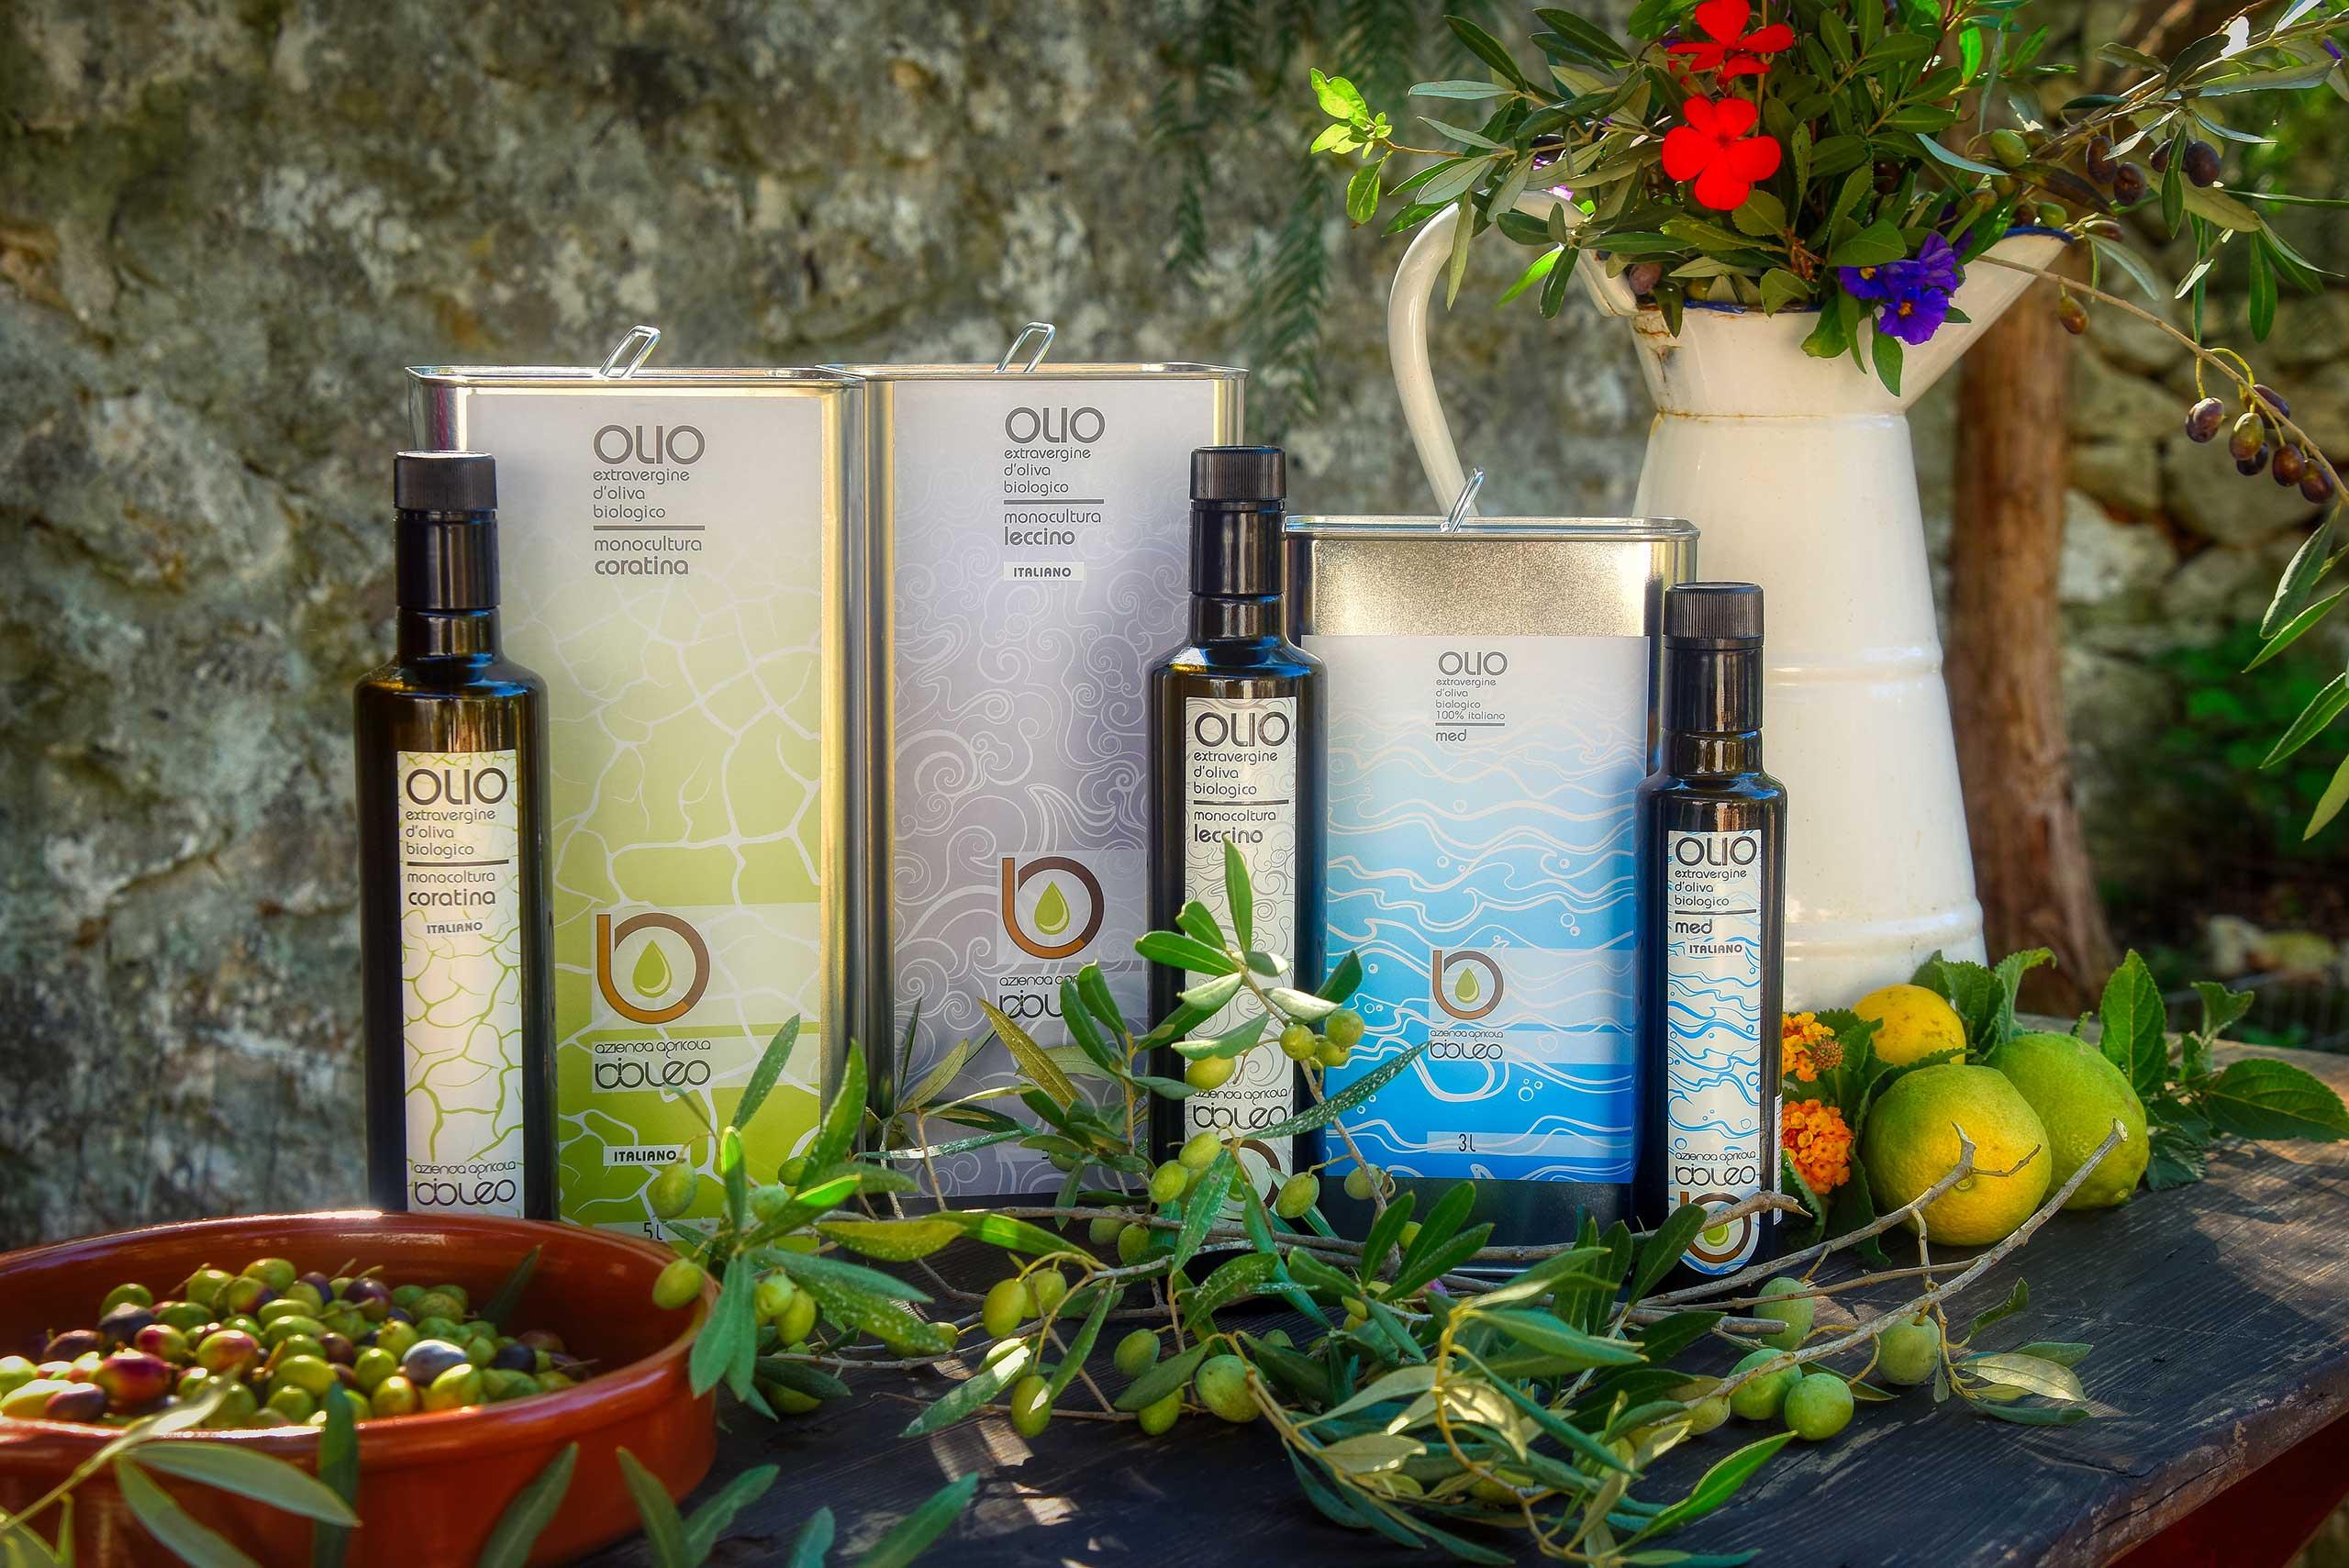 Azienda Agricola Bioleo - Olio extra vergine di oliva biologico